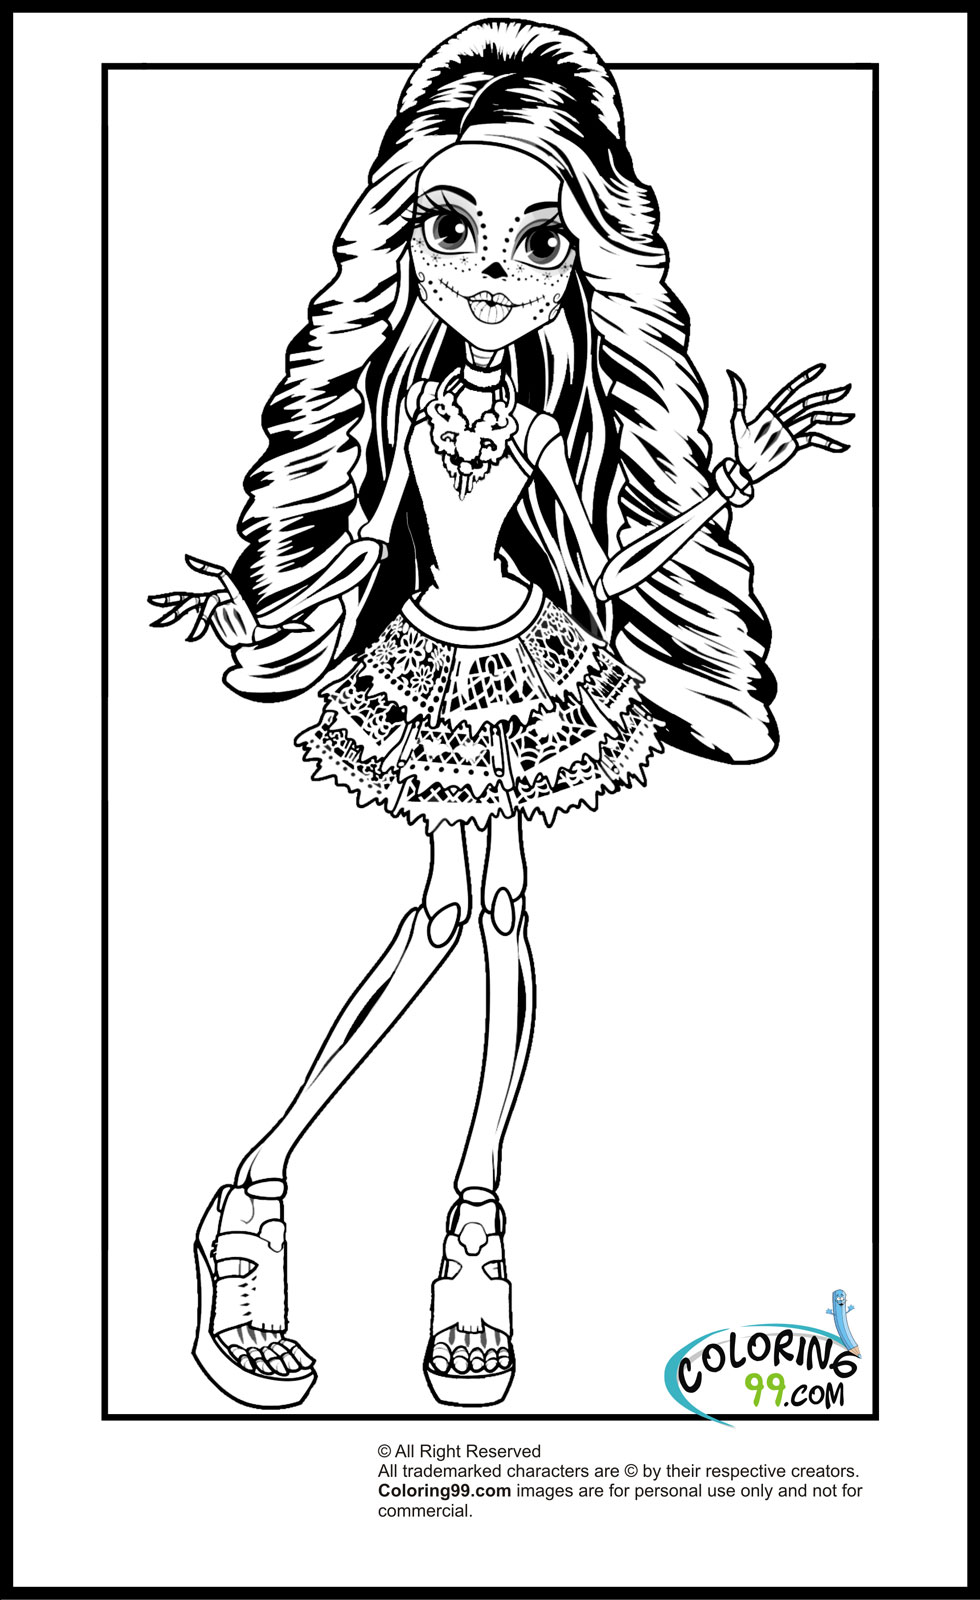 Monster High Ausmalbilder Gratis : My Little Pony Monster High Coloring Pages Best Ideas For